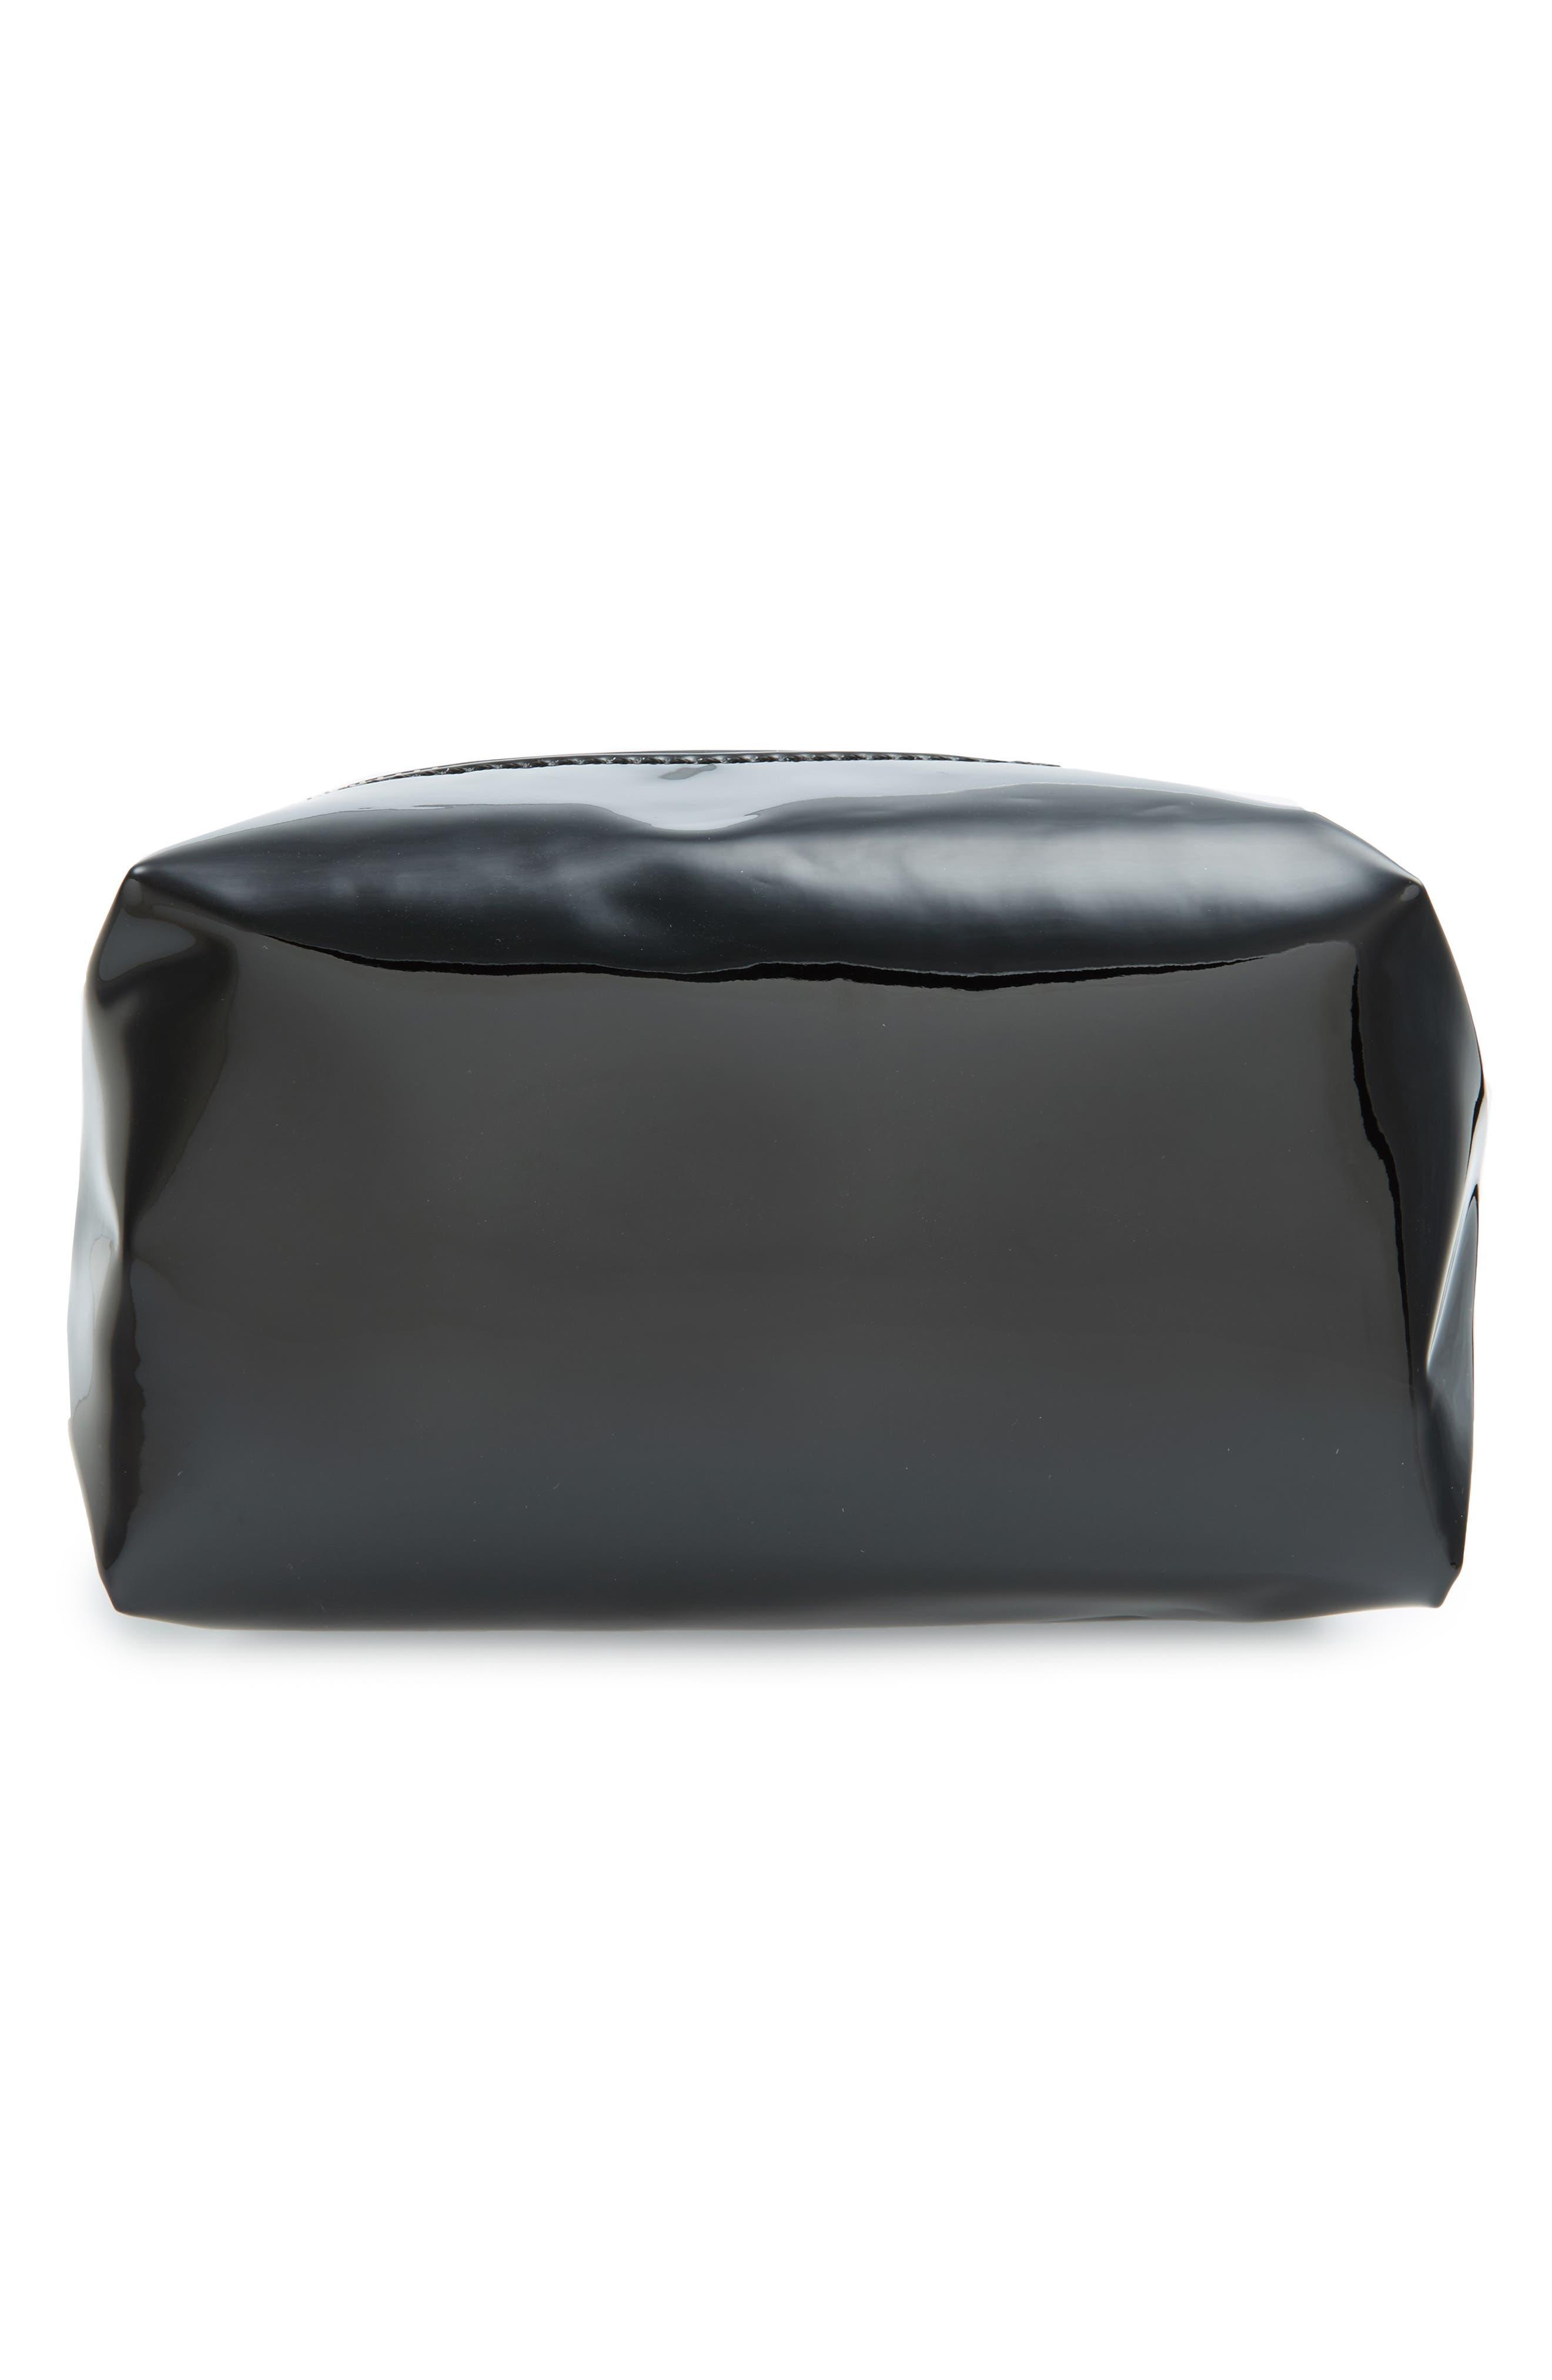 Metallic Cosmetics Bag,                             Main thumbnail 1, color,                             001